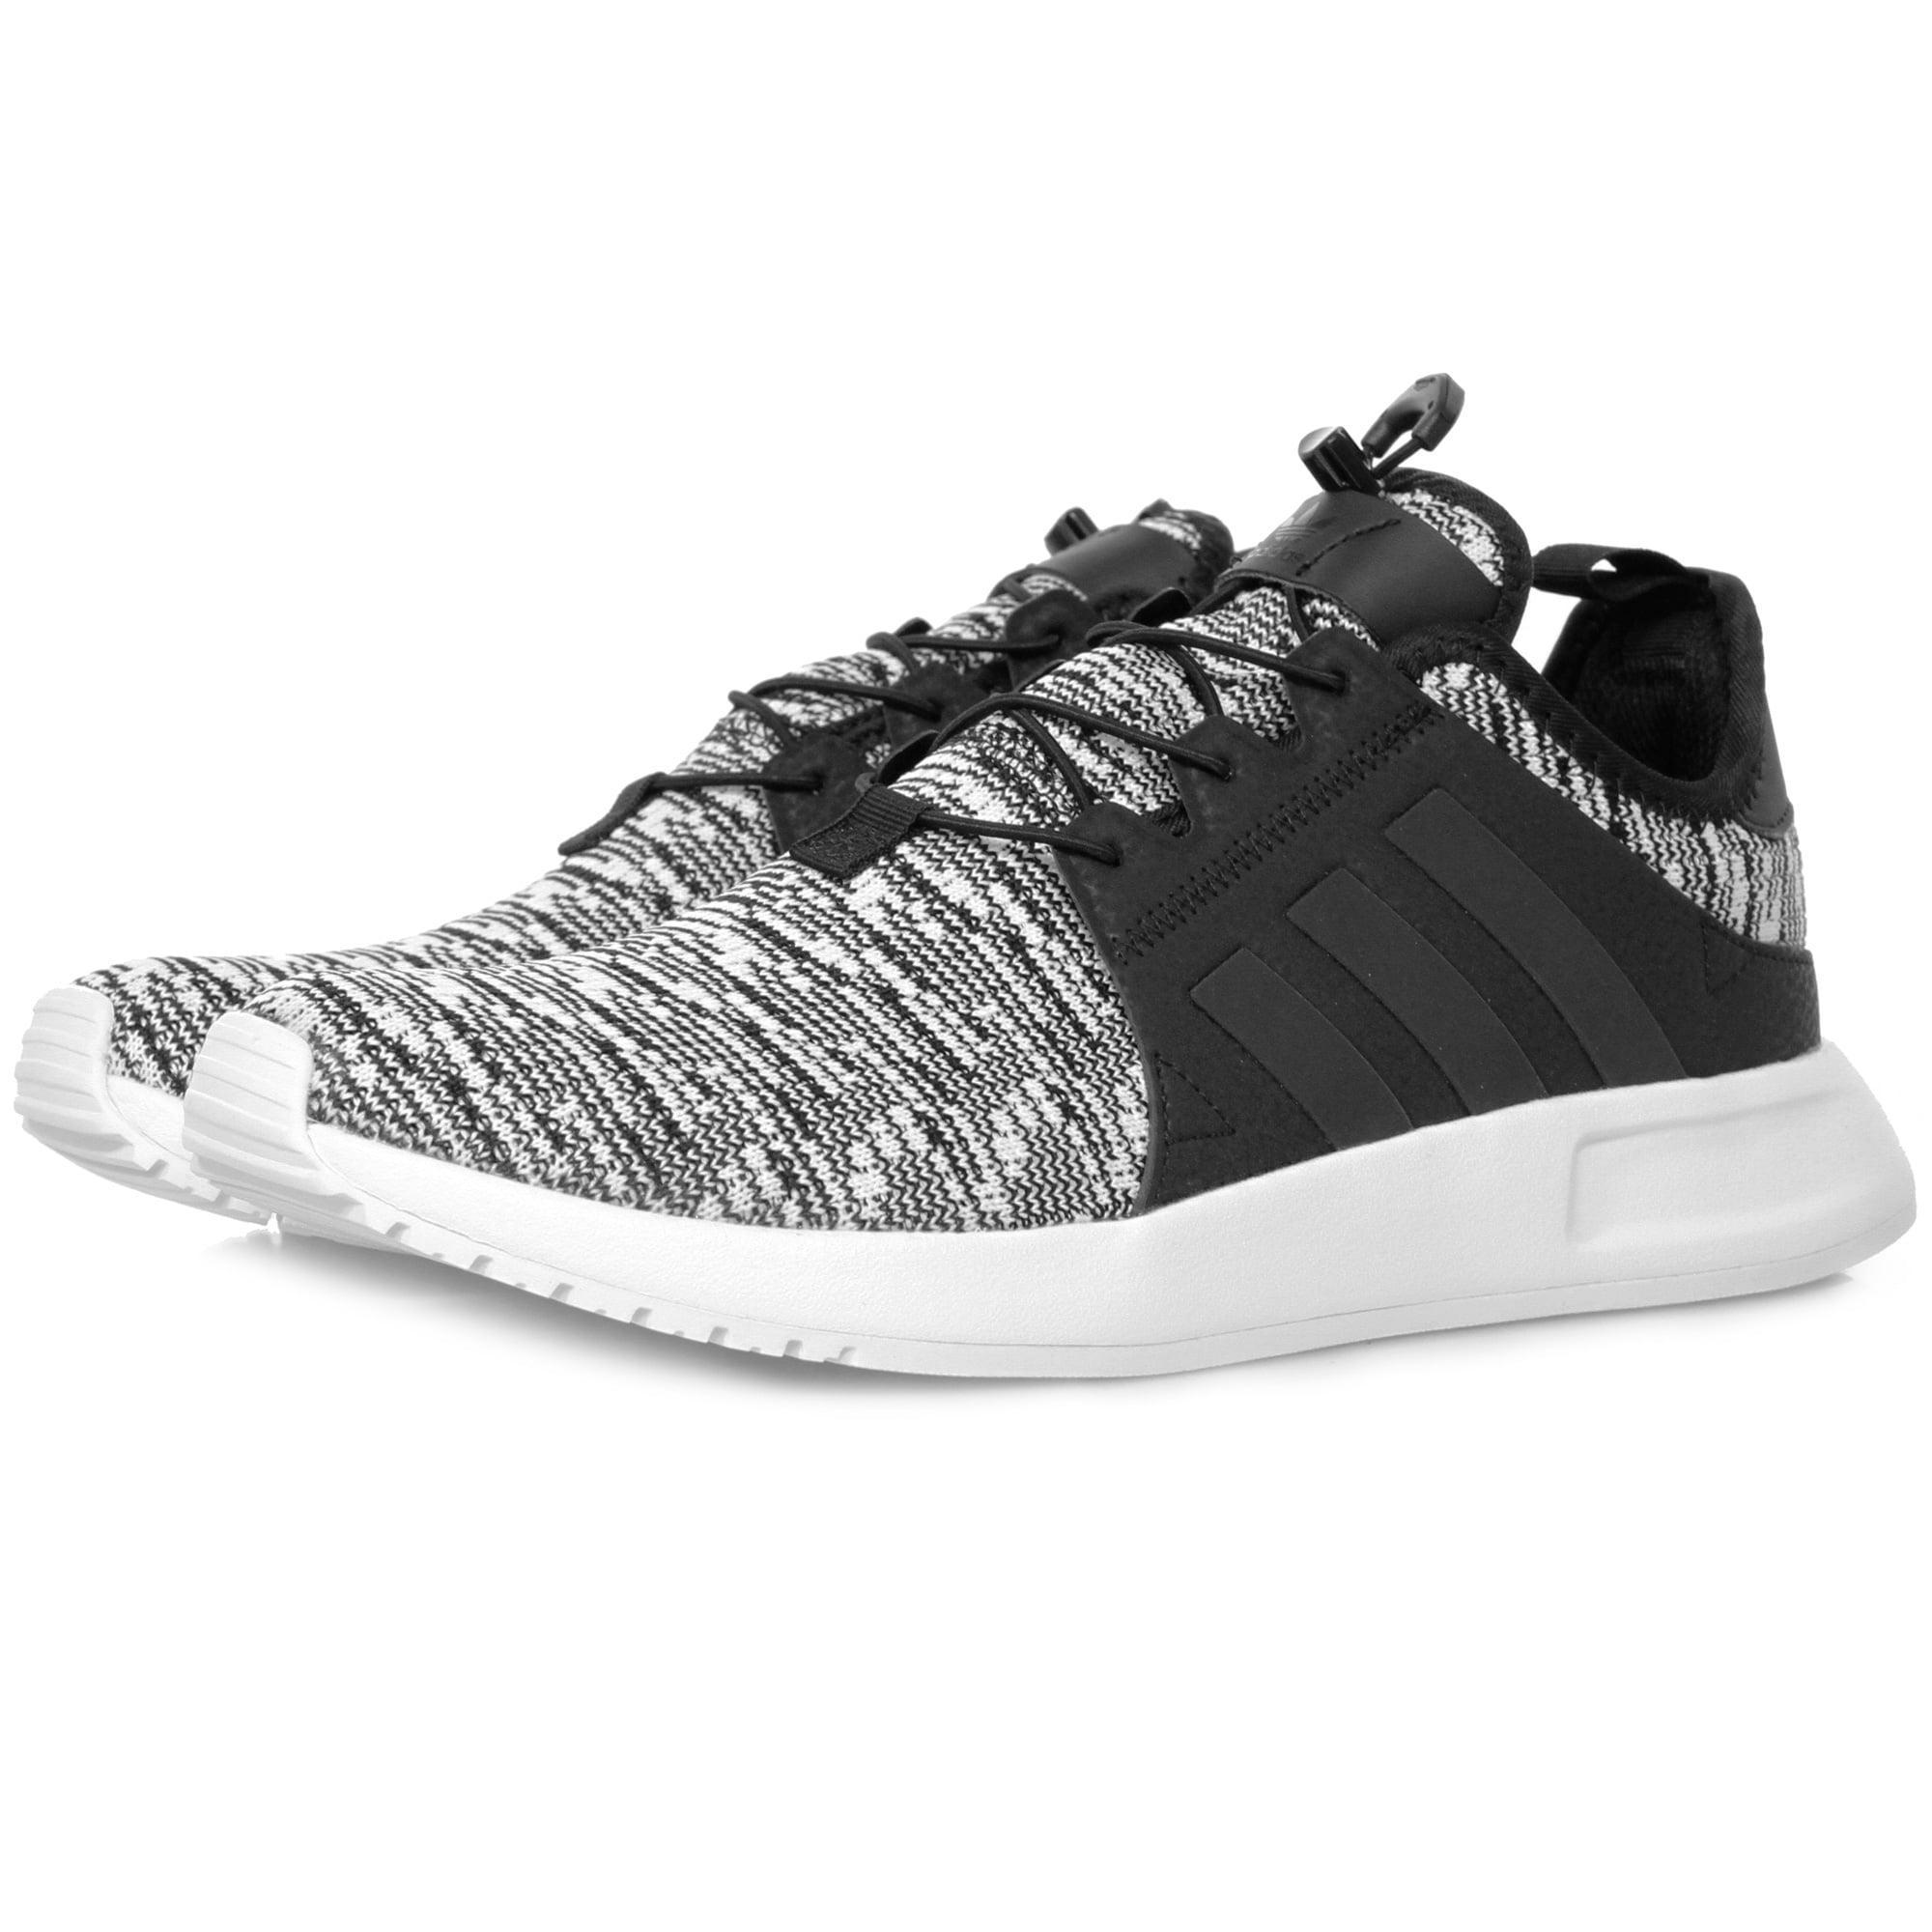 78ee28afc416 mens adidas originals x plr shoes core black white bb2899